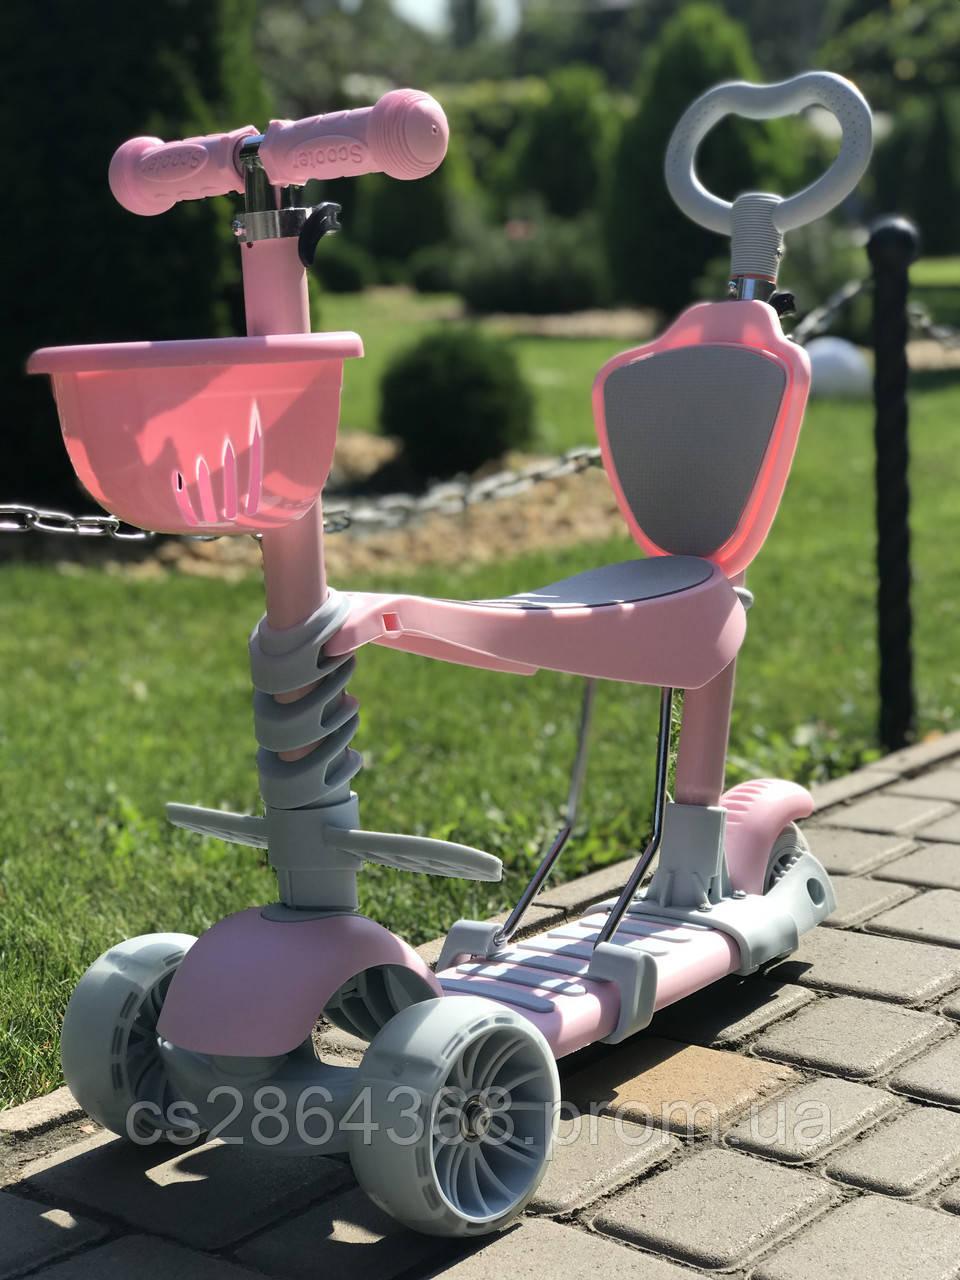 Самокат-беговел ScooTer Smart Pastel 5 in 1 Pink: 2+, ABEC-7